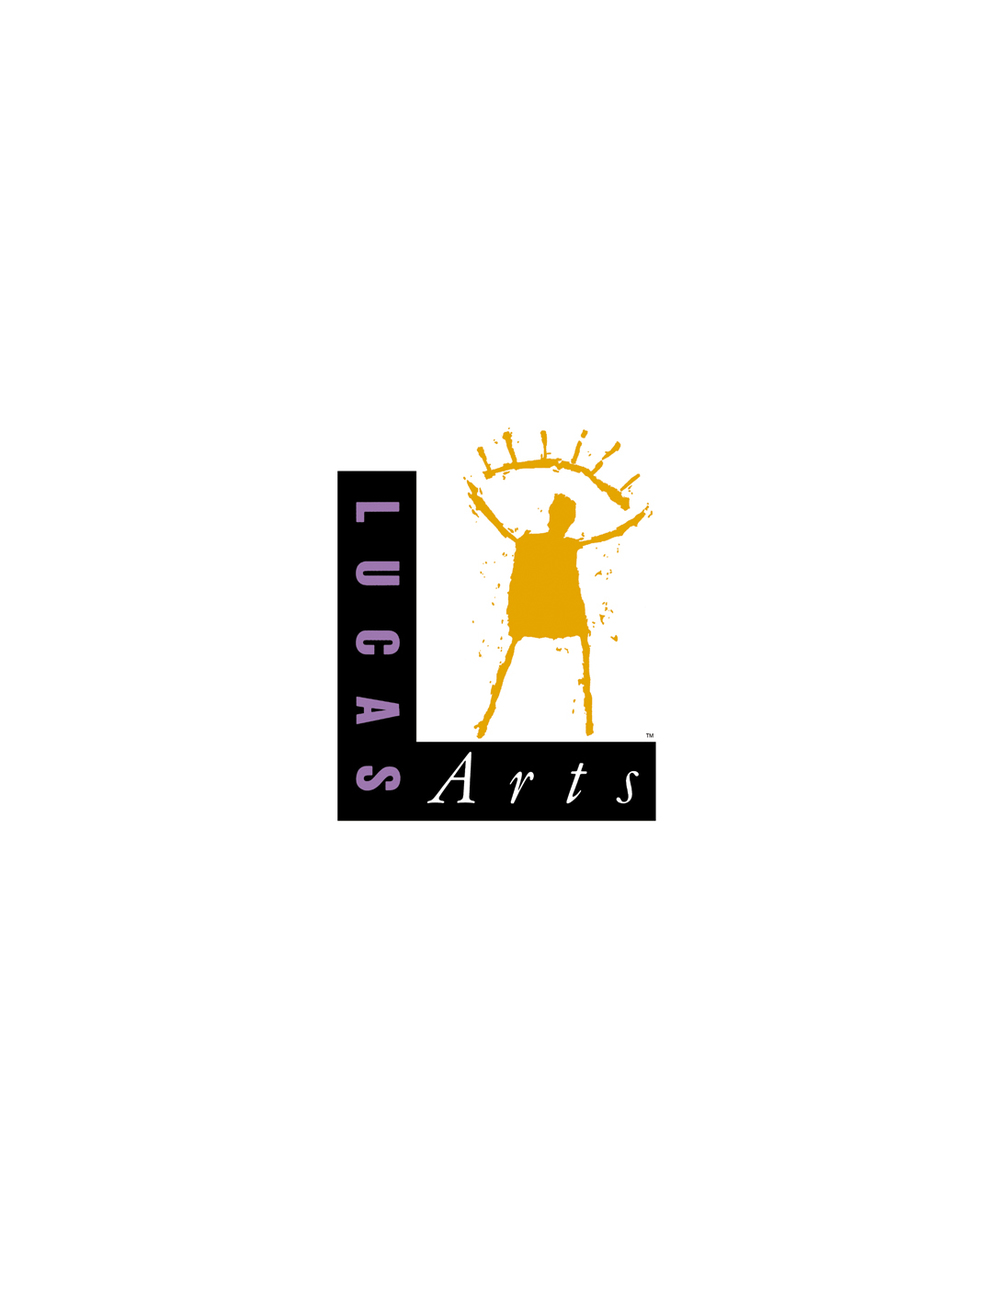 LucasArts identity